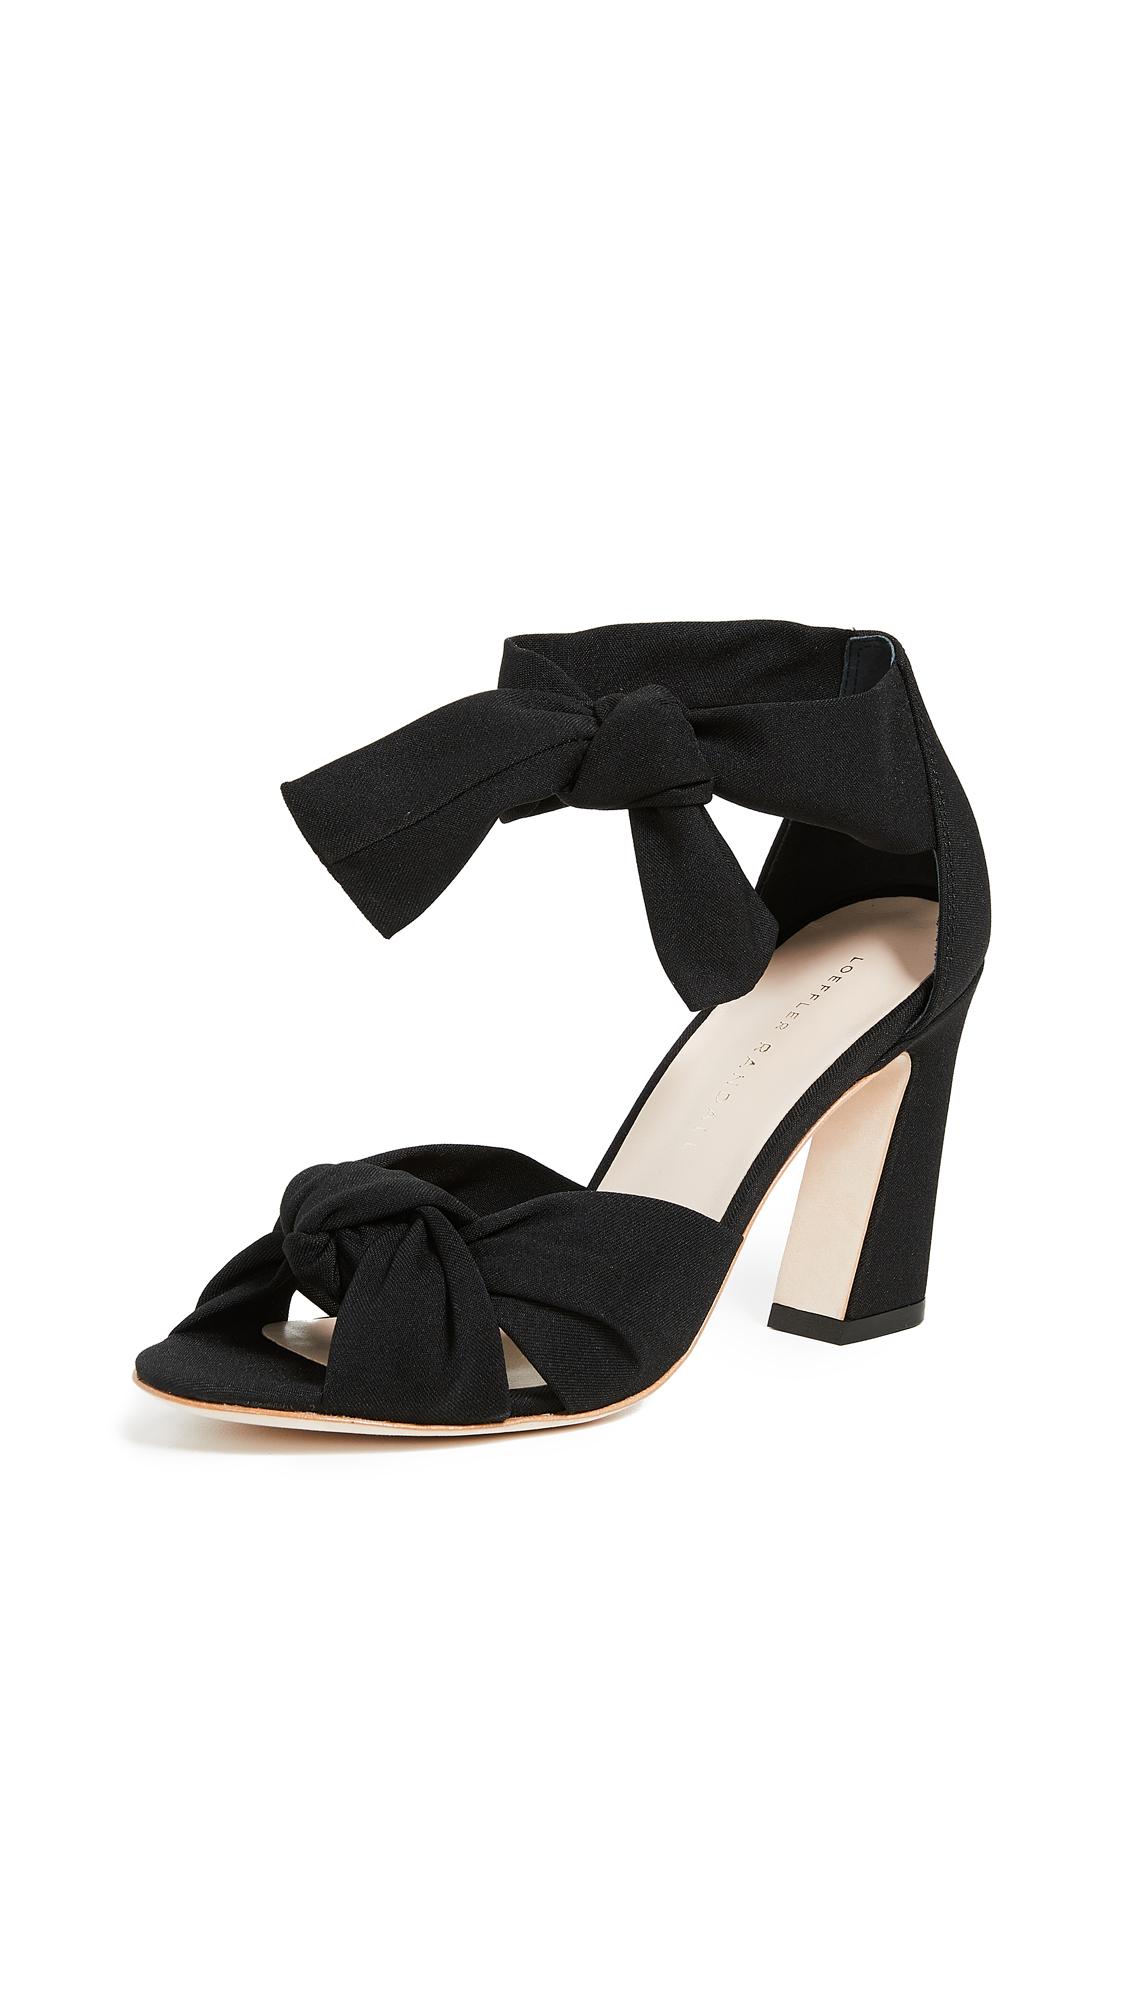 Loeffler Randall Nan Ankle Tie Sandals - Black